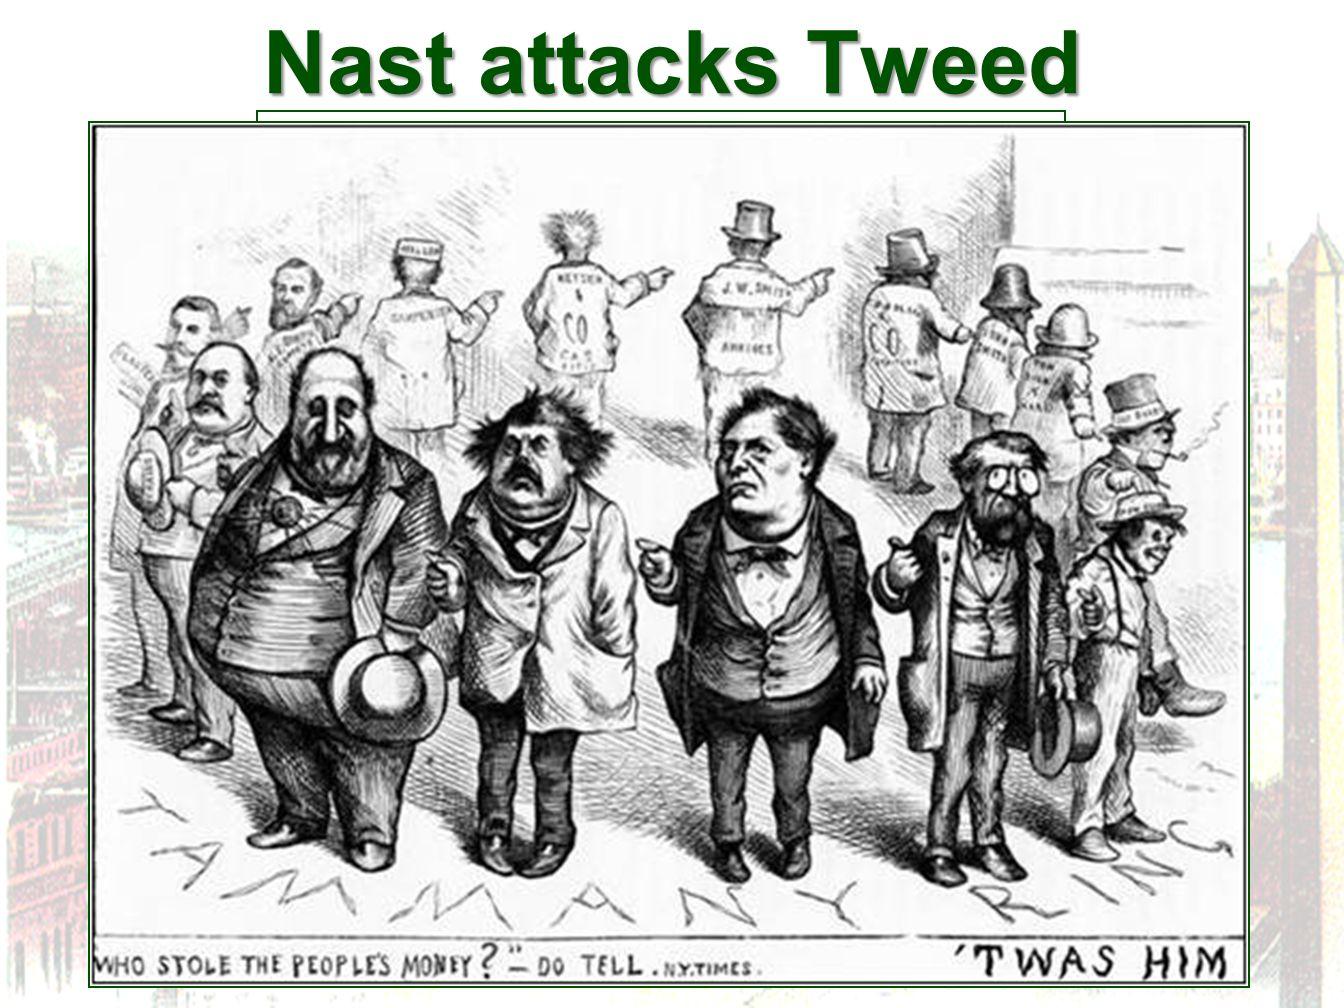 Nast attacks Tweed